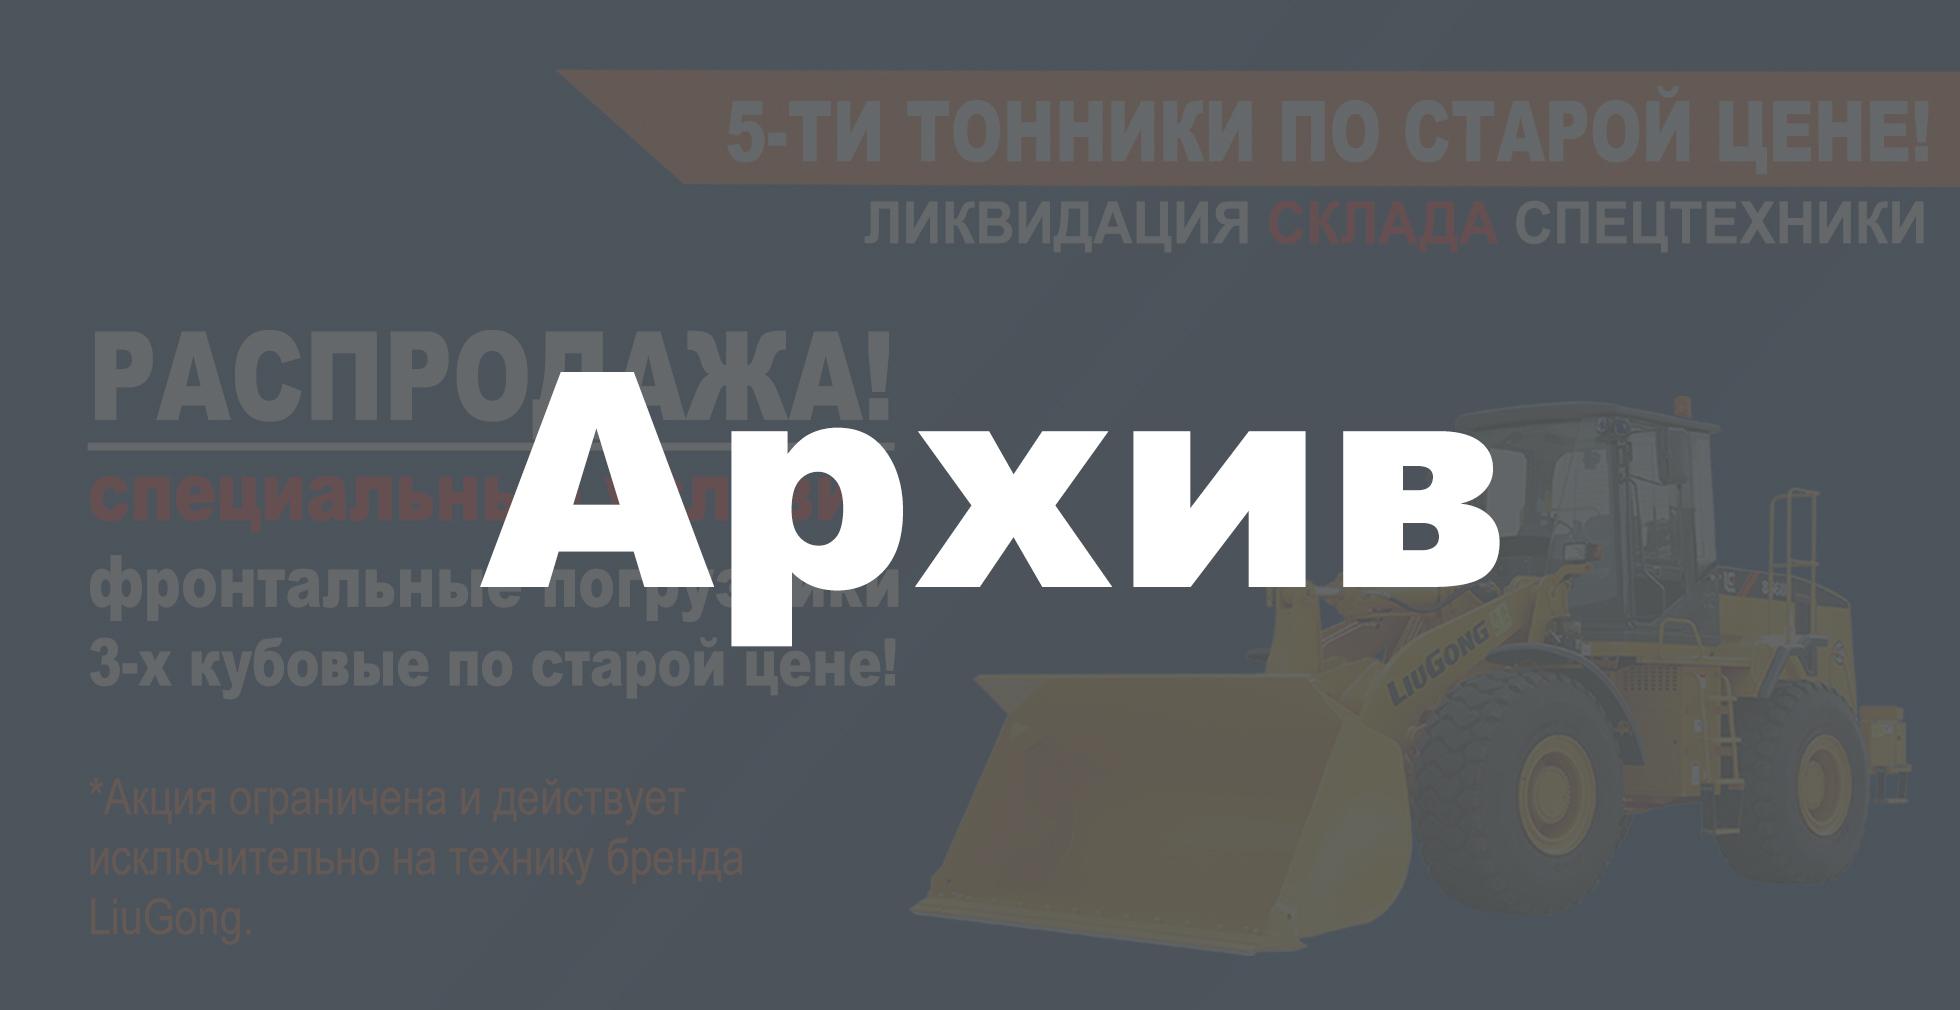 Шаблон-Архив-Акции-распродажа-5тонников